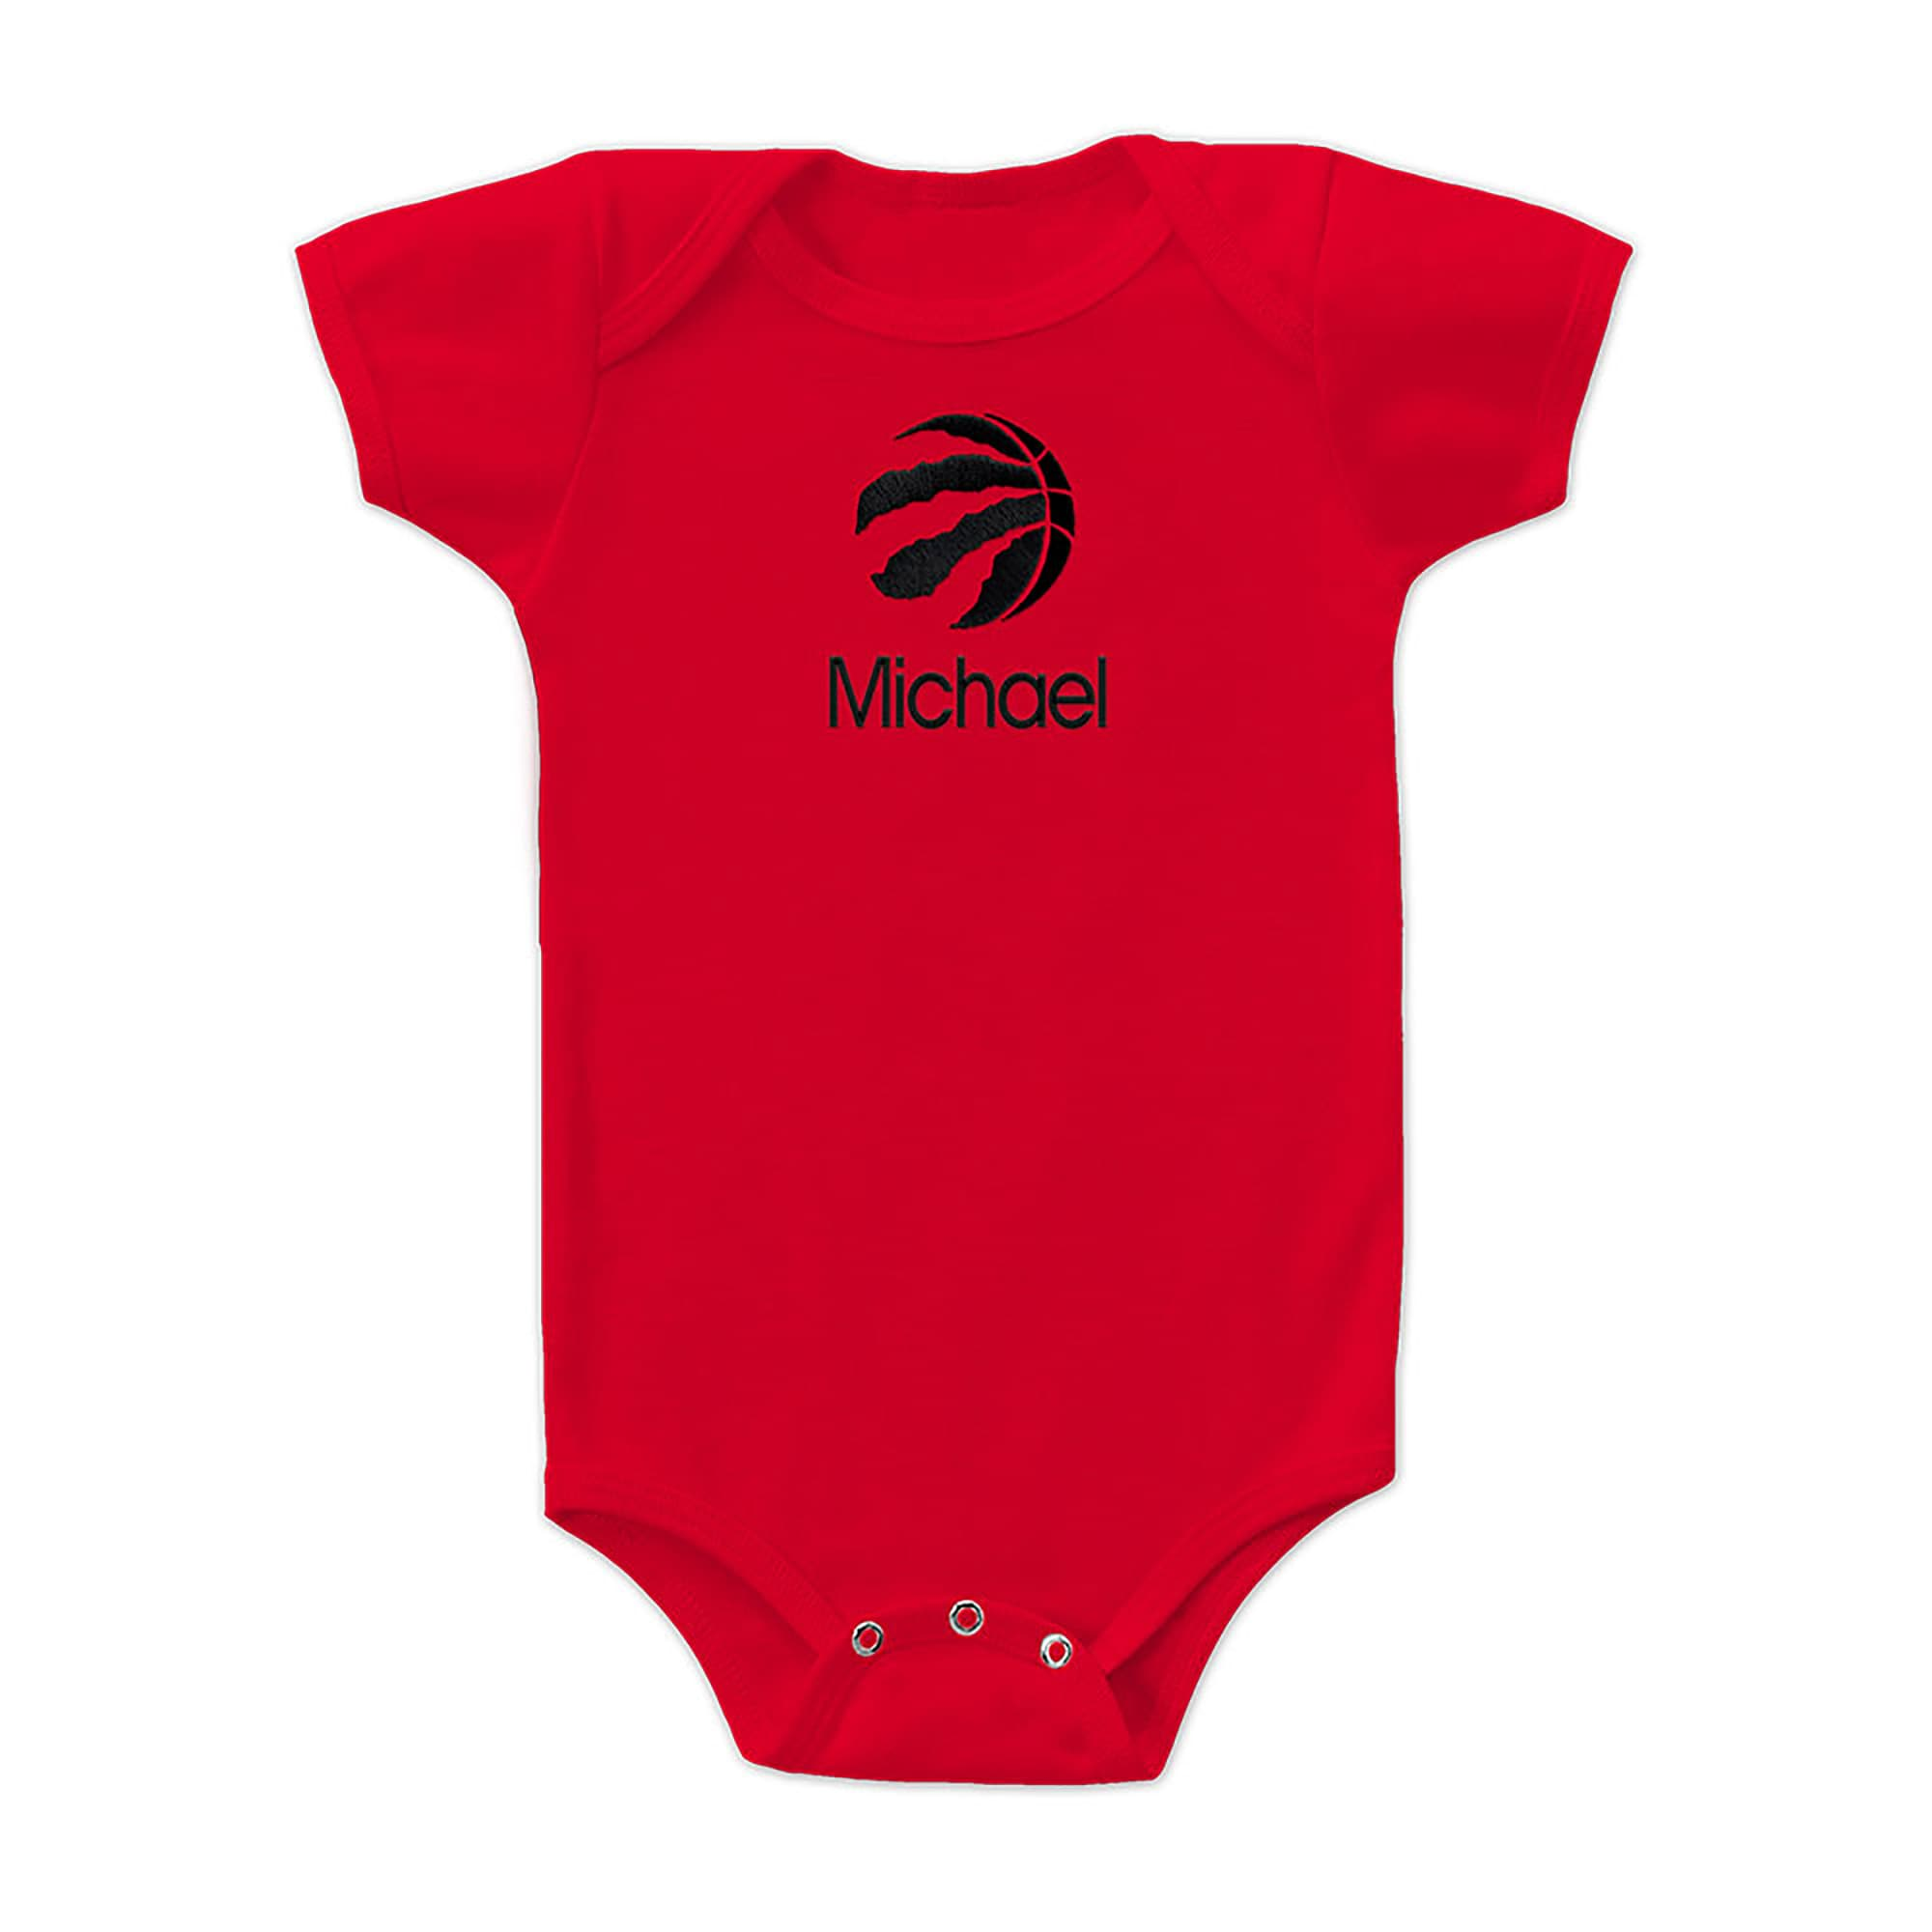 Toronto Raptors Infant Personalized Bodysuit - Red